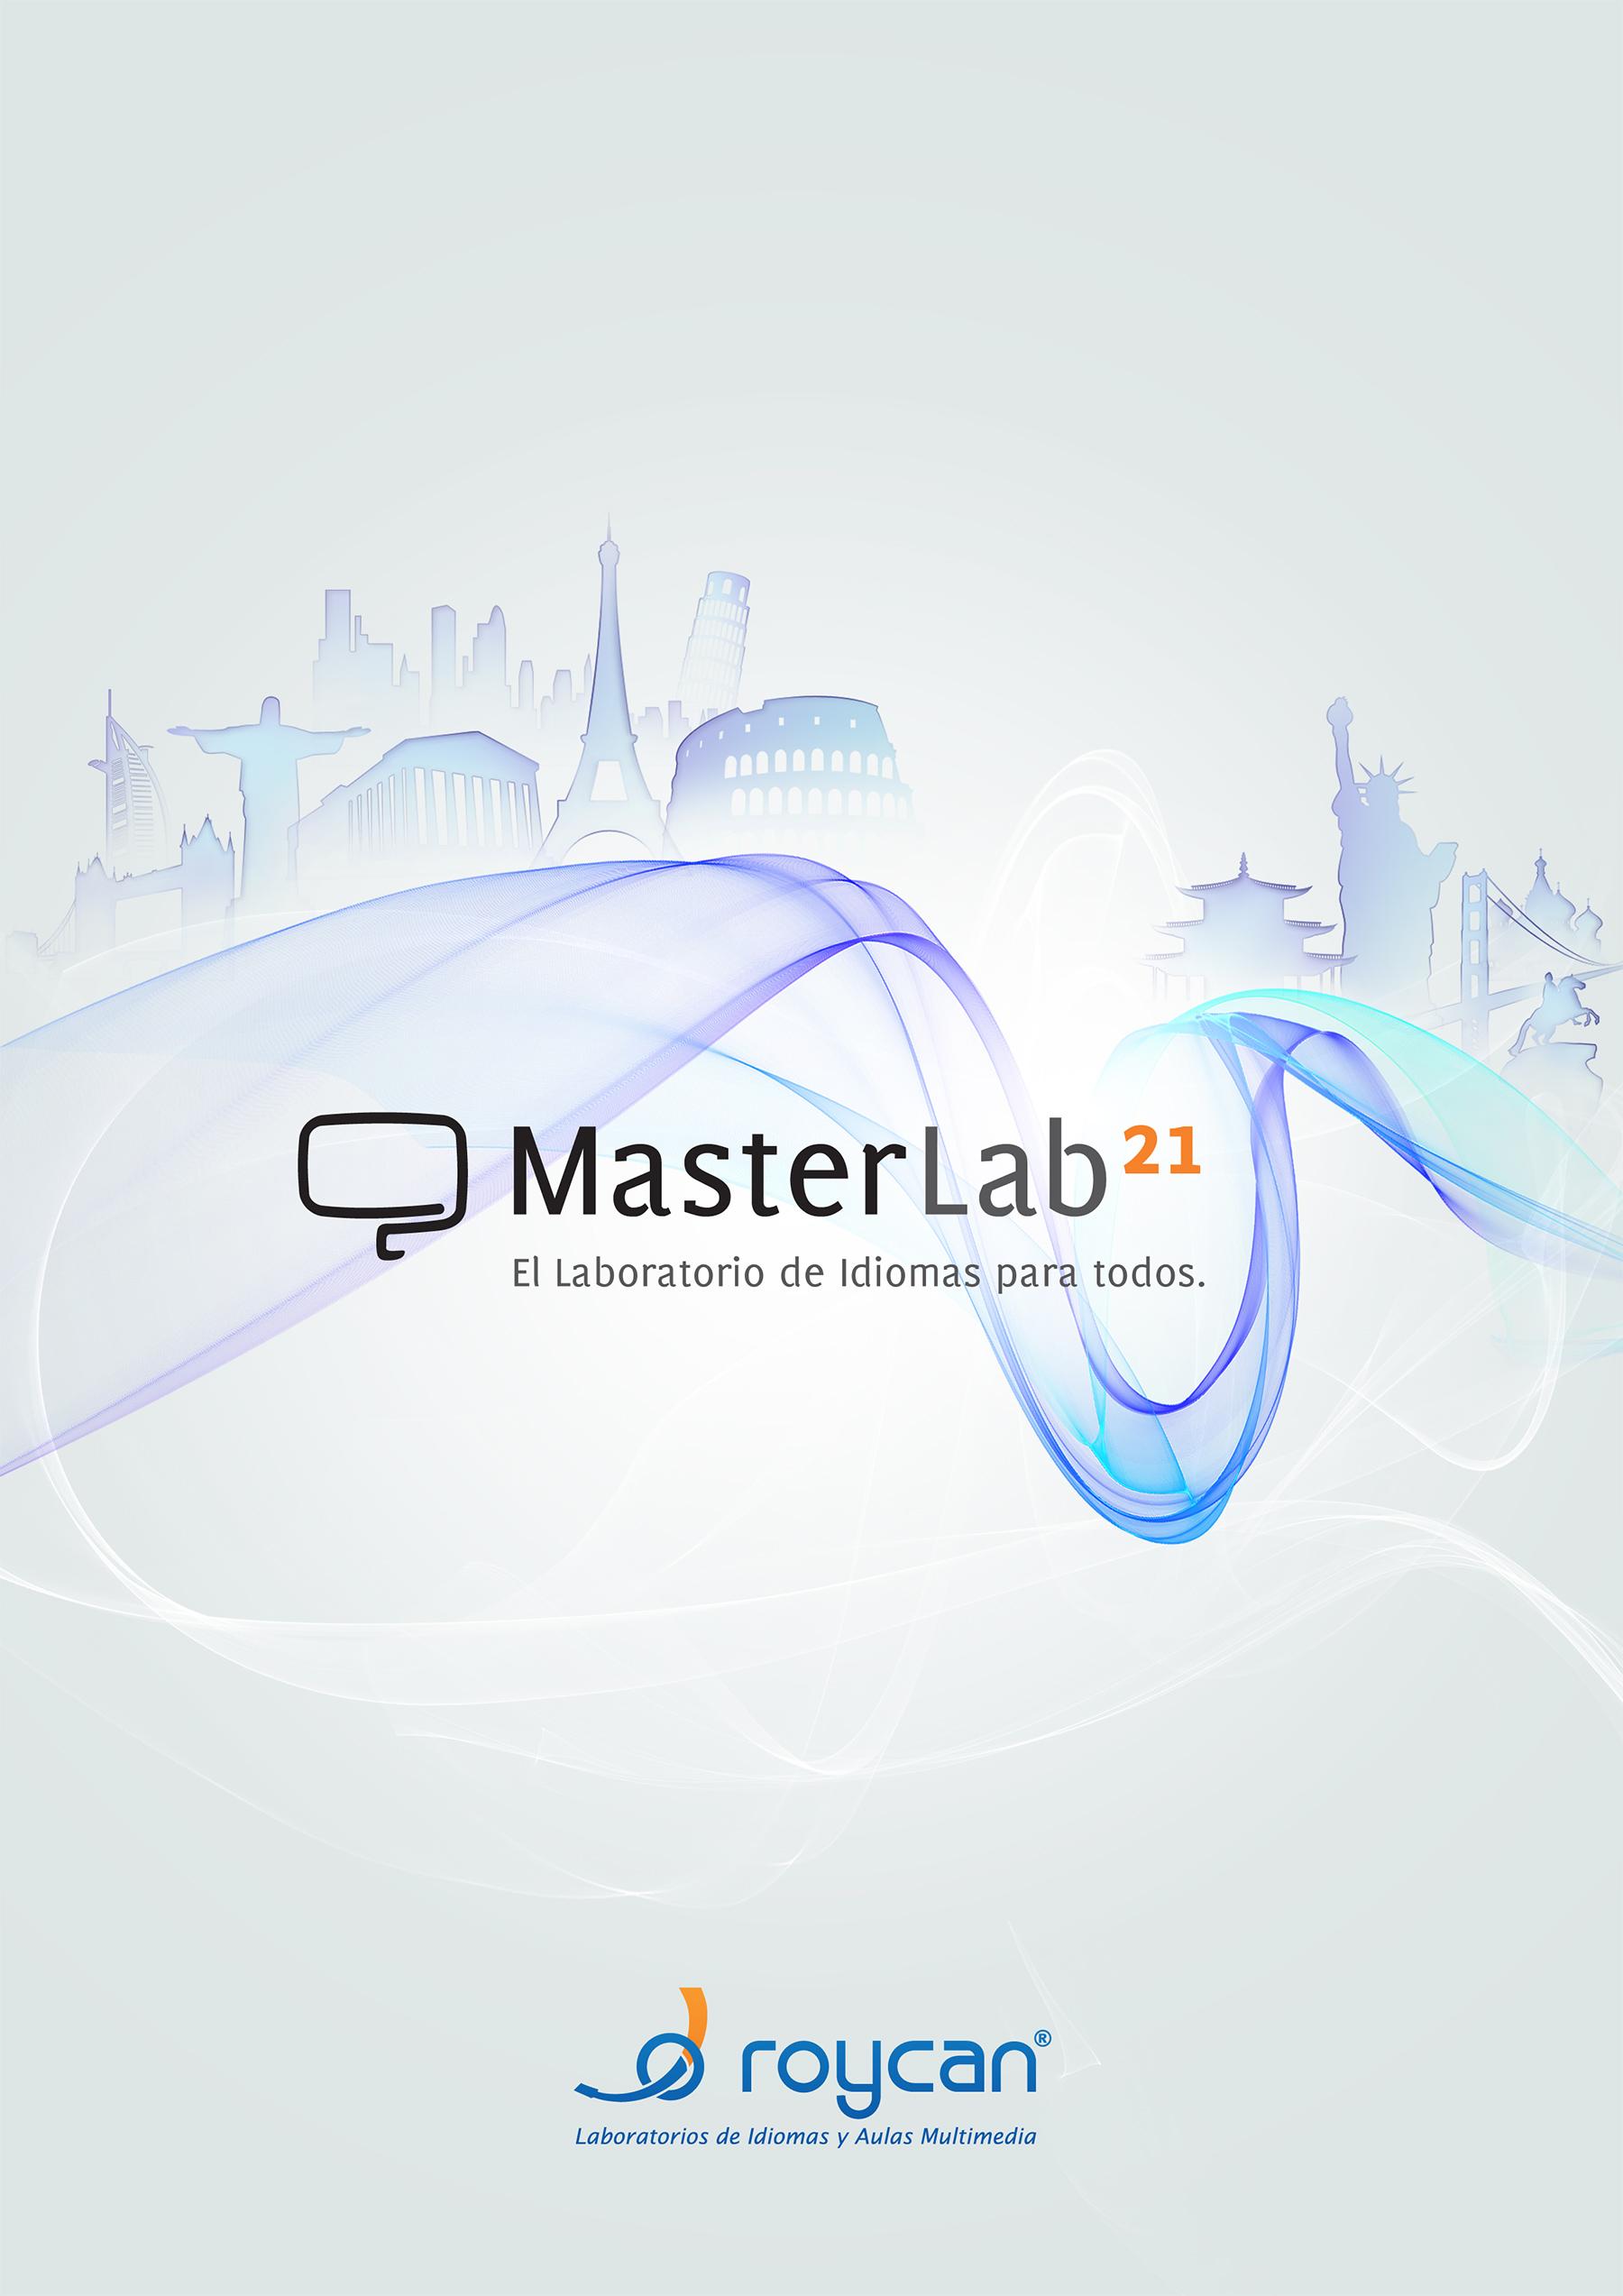 Portada Laboratorio Idiomas MasterLab 21